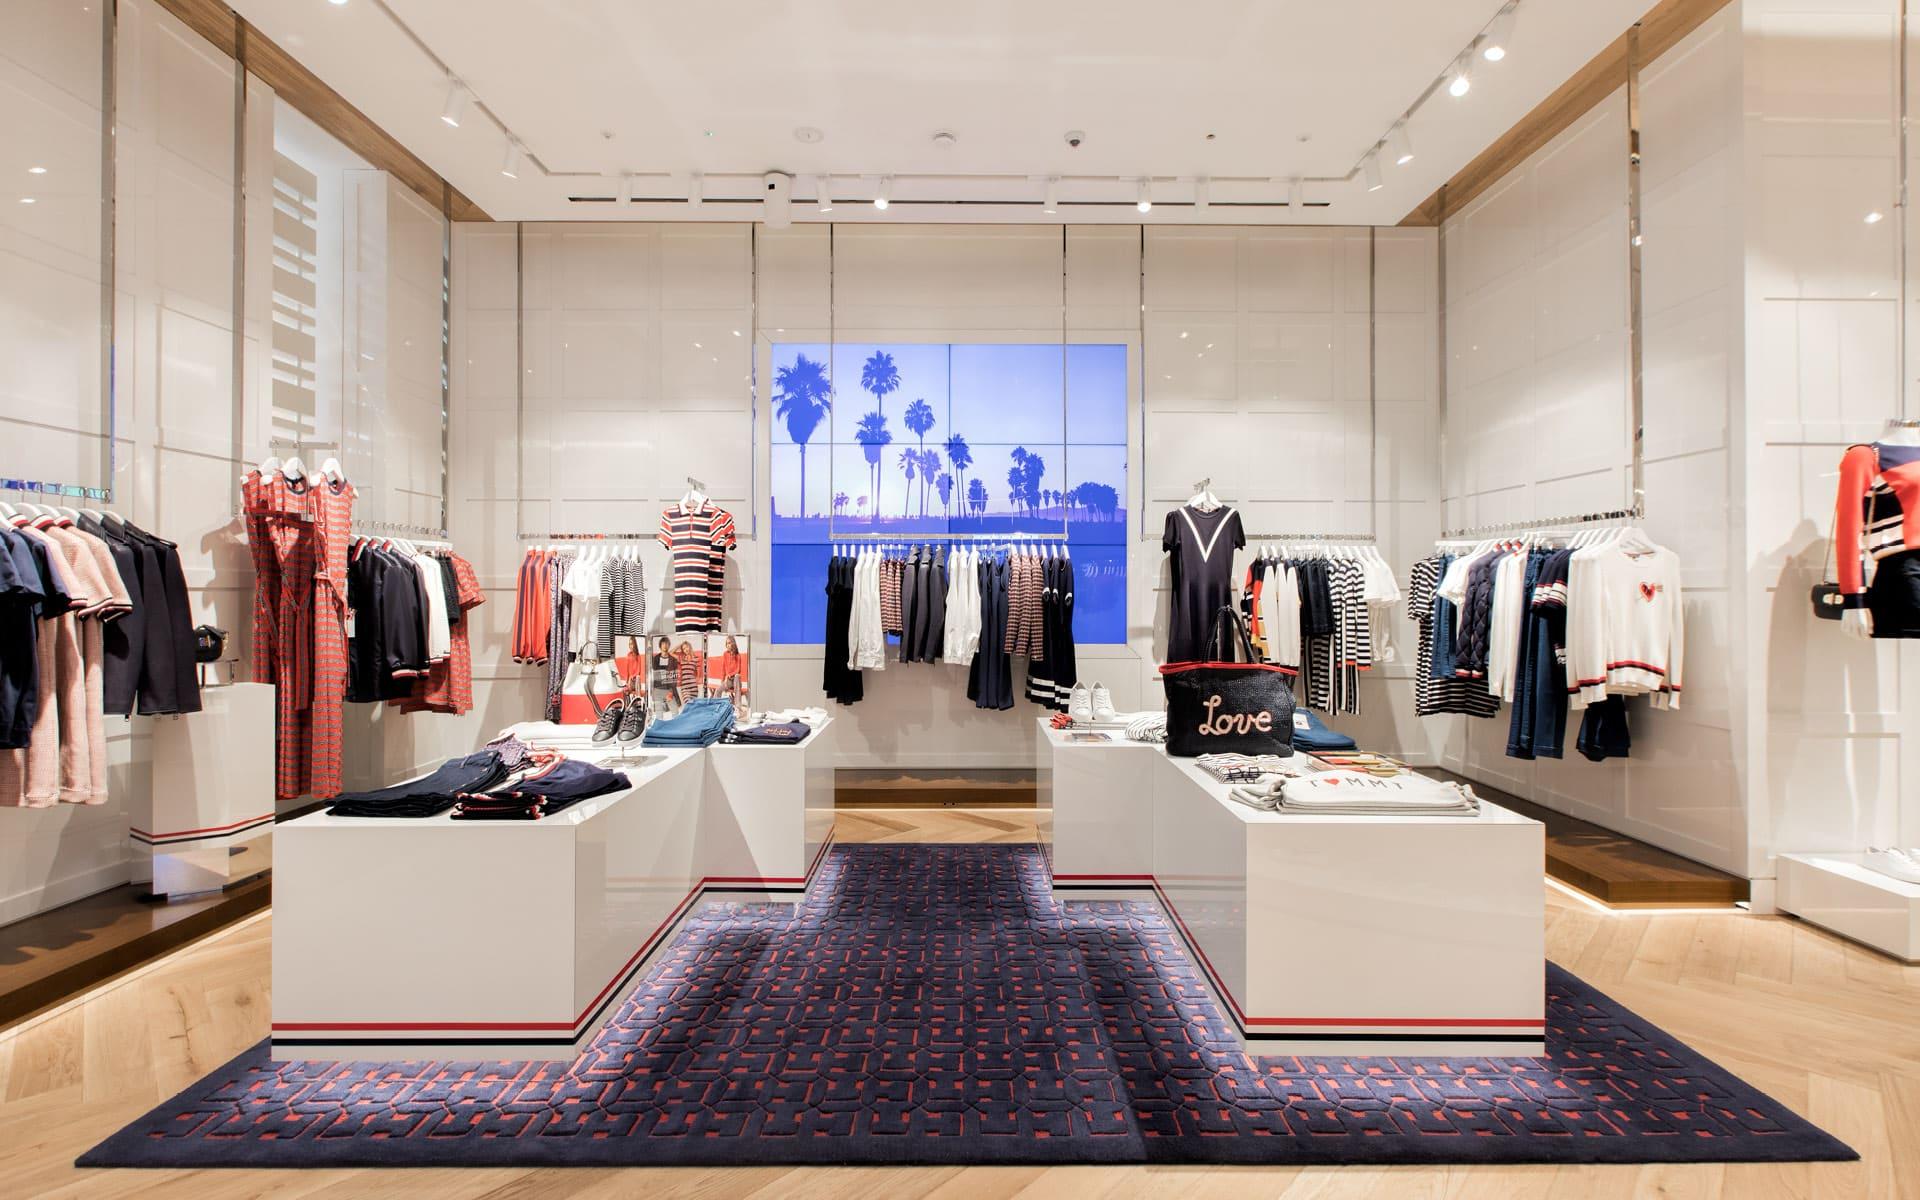 Tommy Hilfiger flagship store in London at Regent St